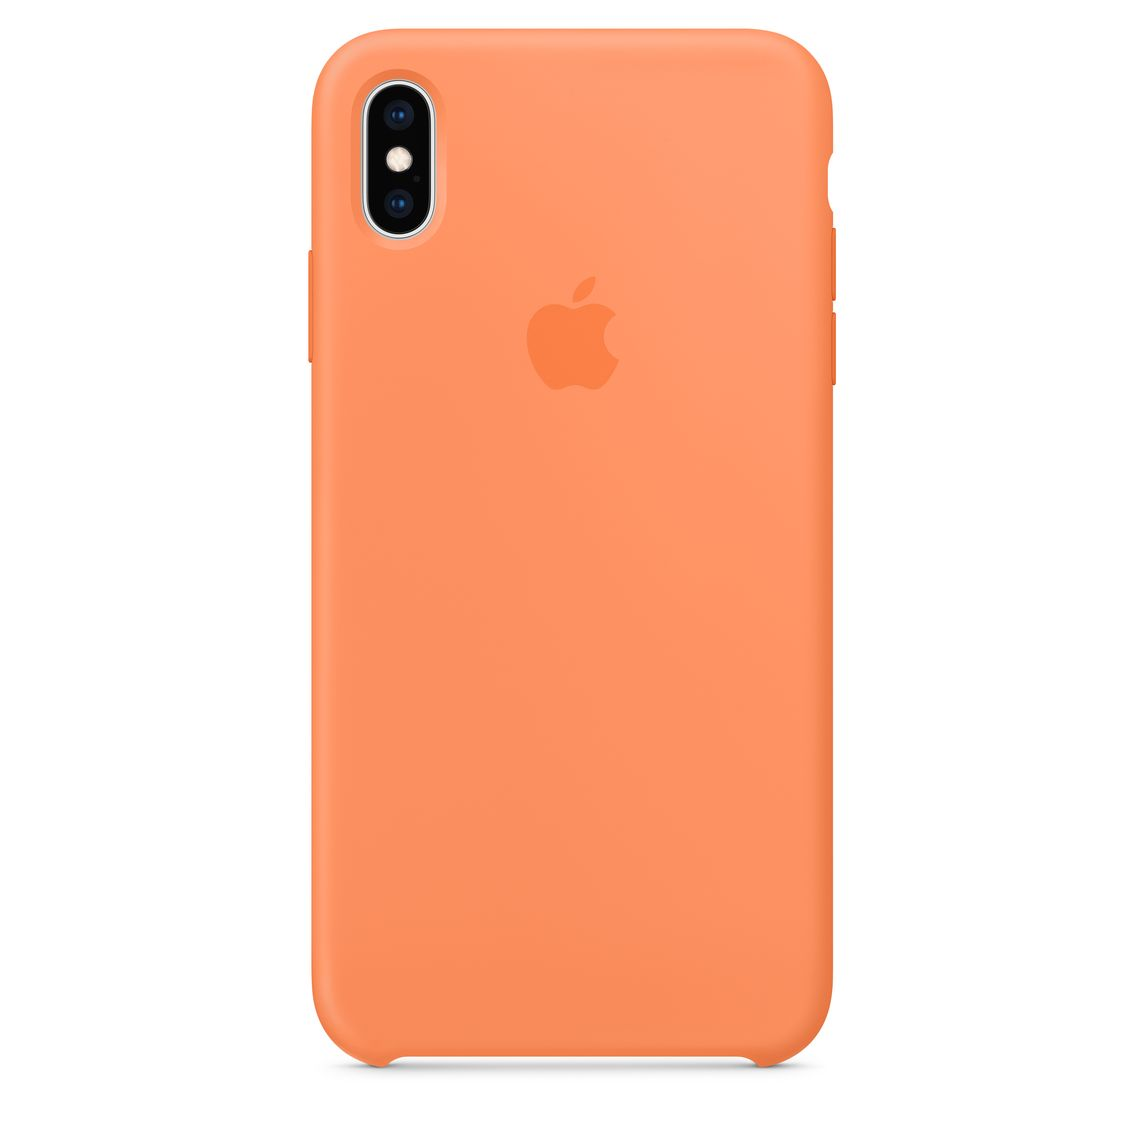 Custodia in silicone per iPhone XS Max - Arancione papaya